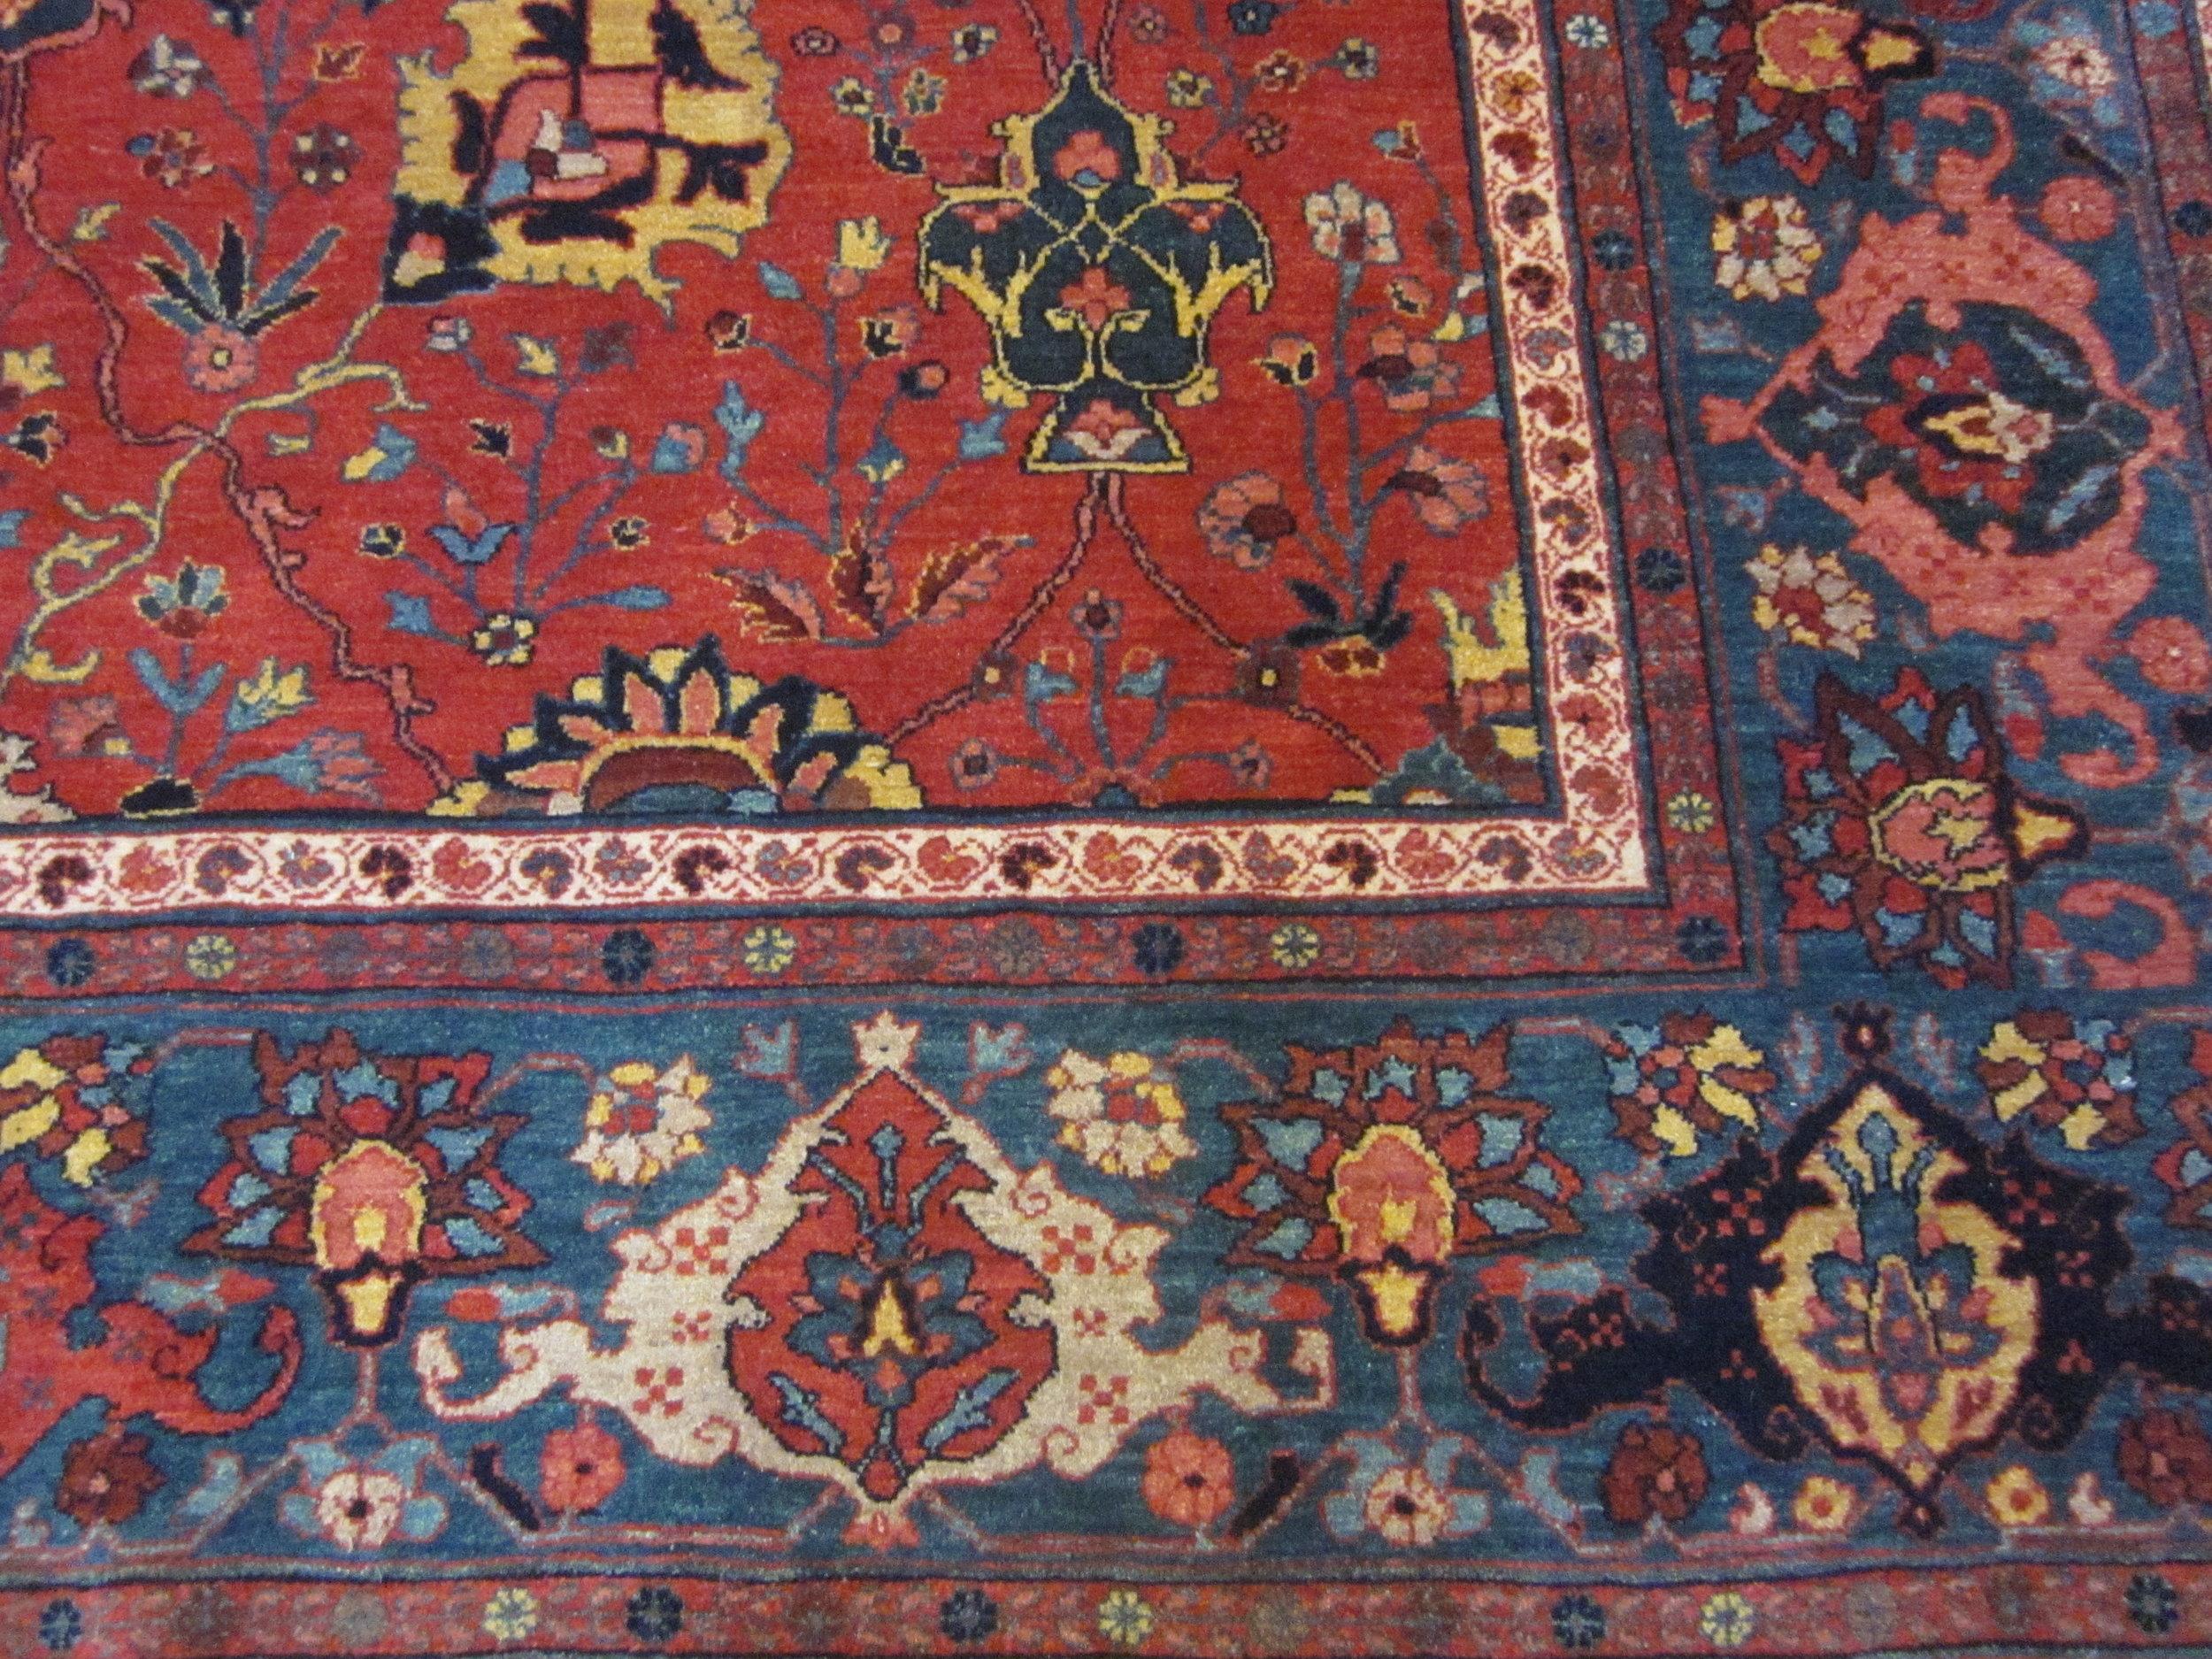 #36b) 8 x 11 Bijar carpet, border close-up. Beautiful jewel tones!